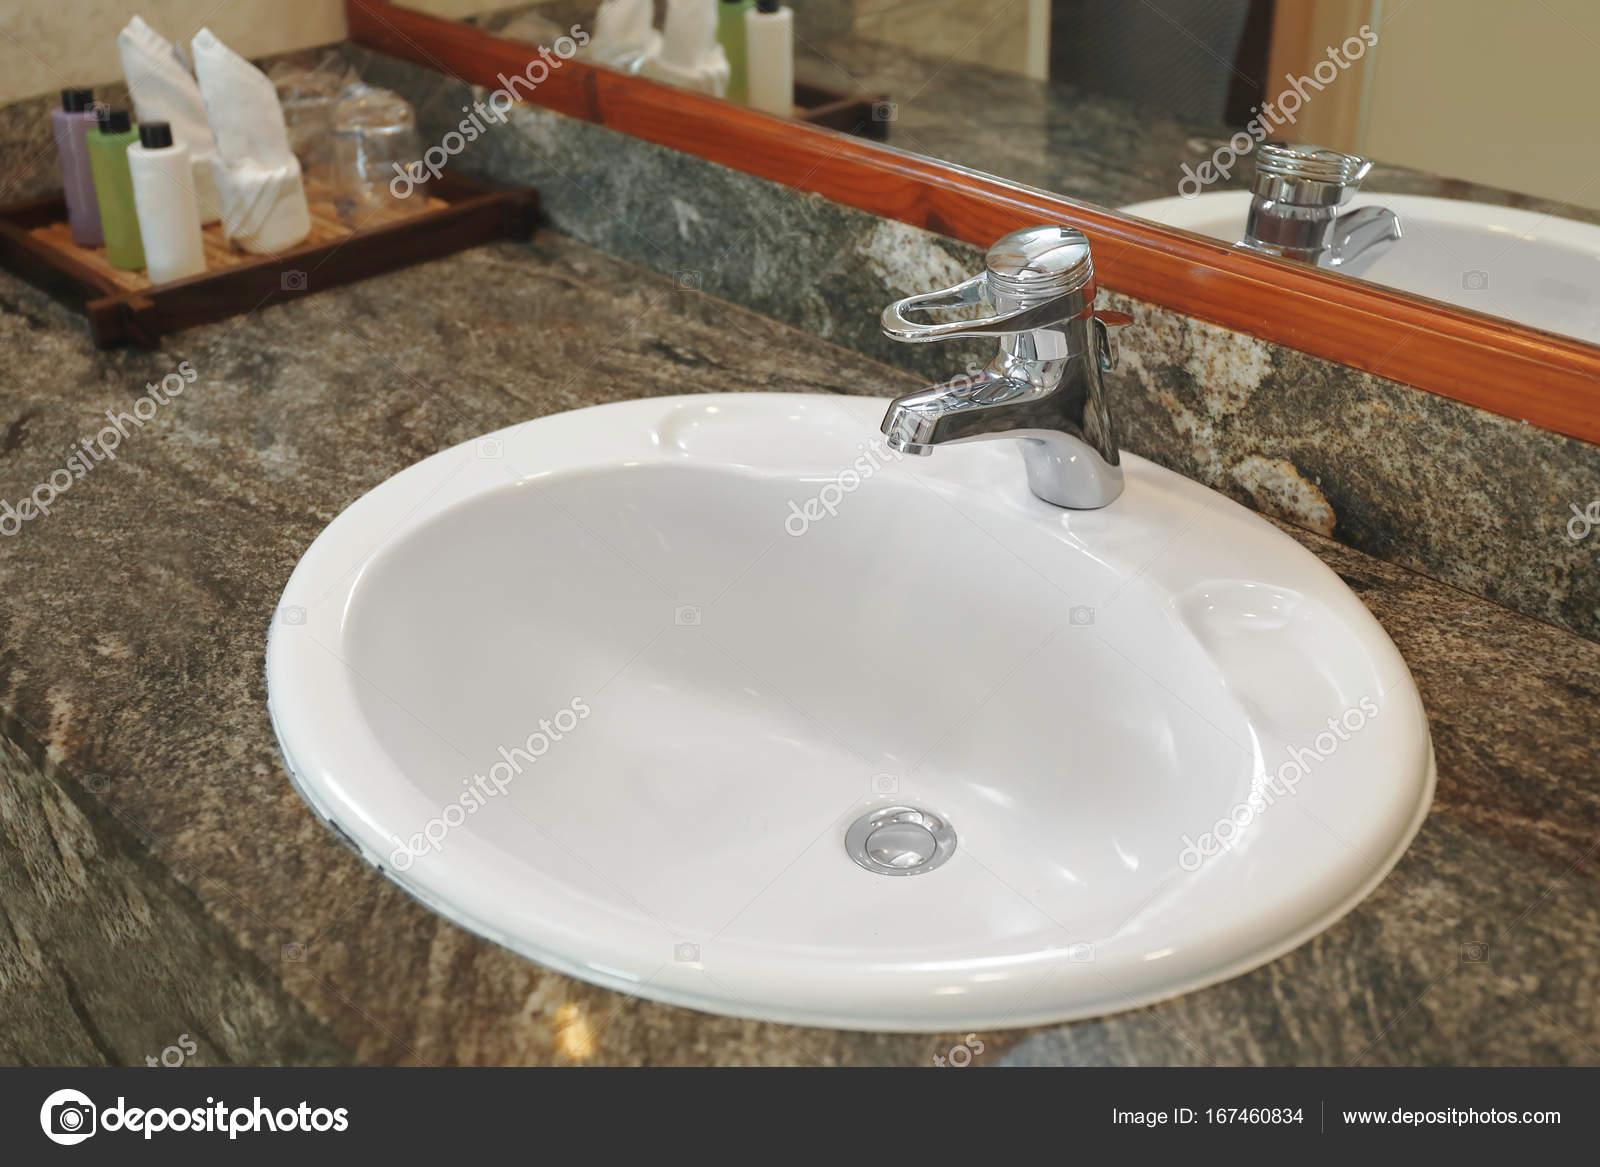 Lavandini Da Bagno Moderni : Lavandino nel bagno moderno hotel u foto stock belchonock